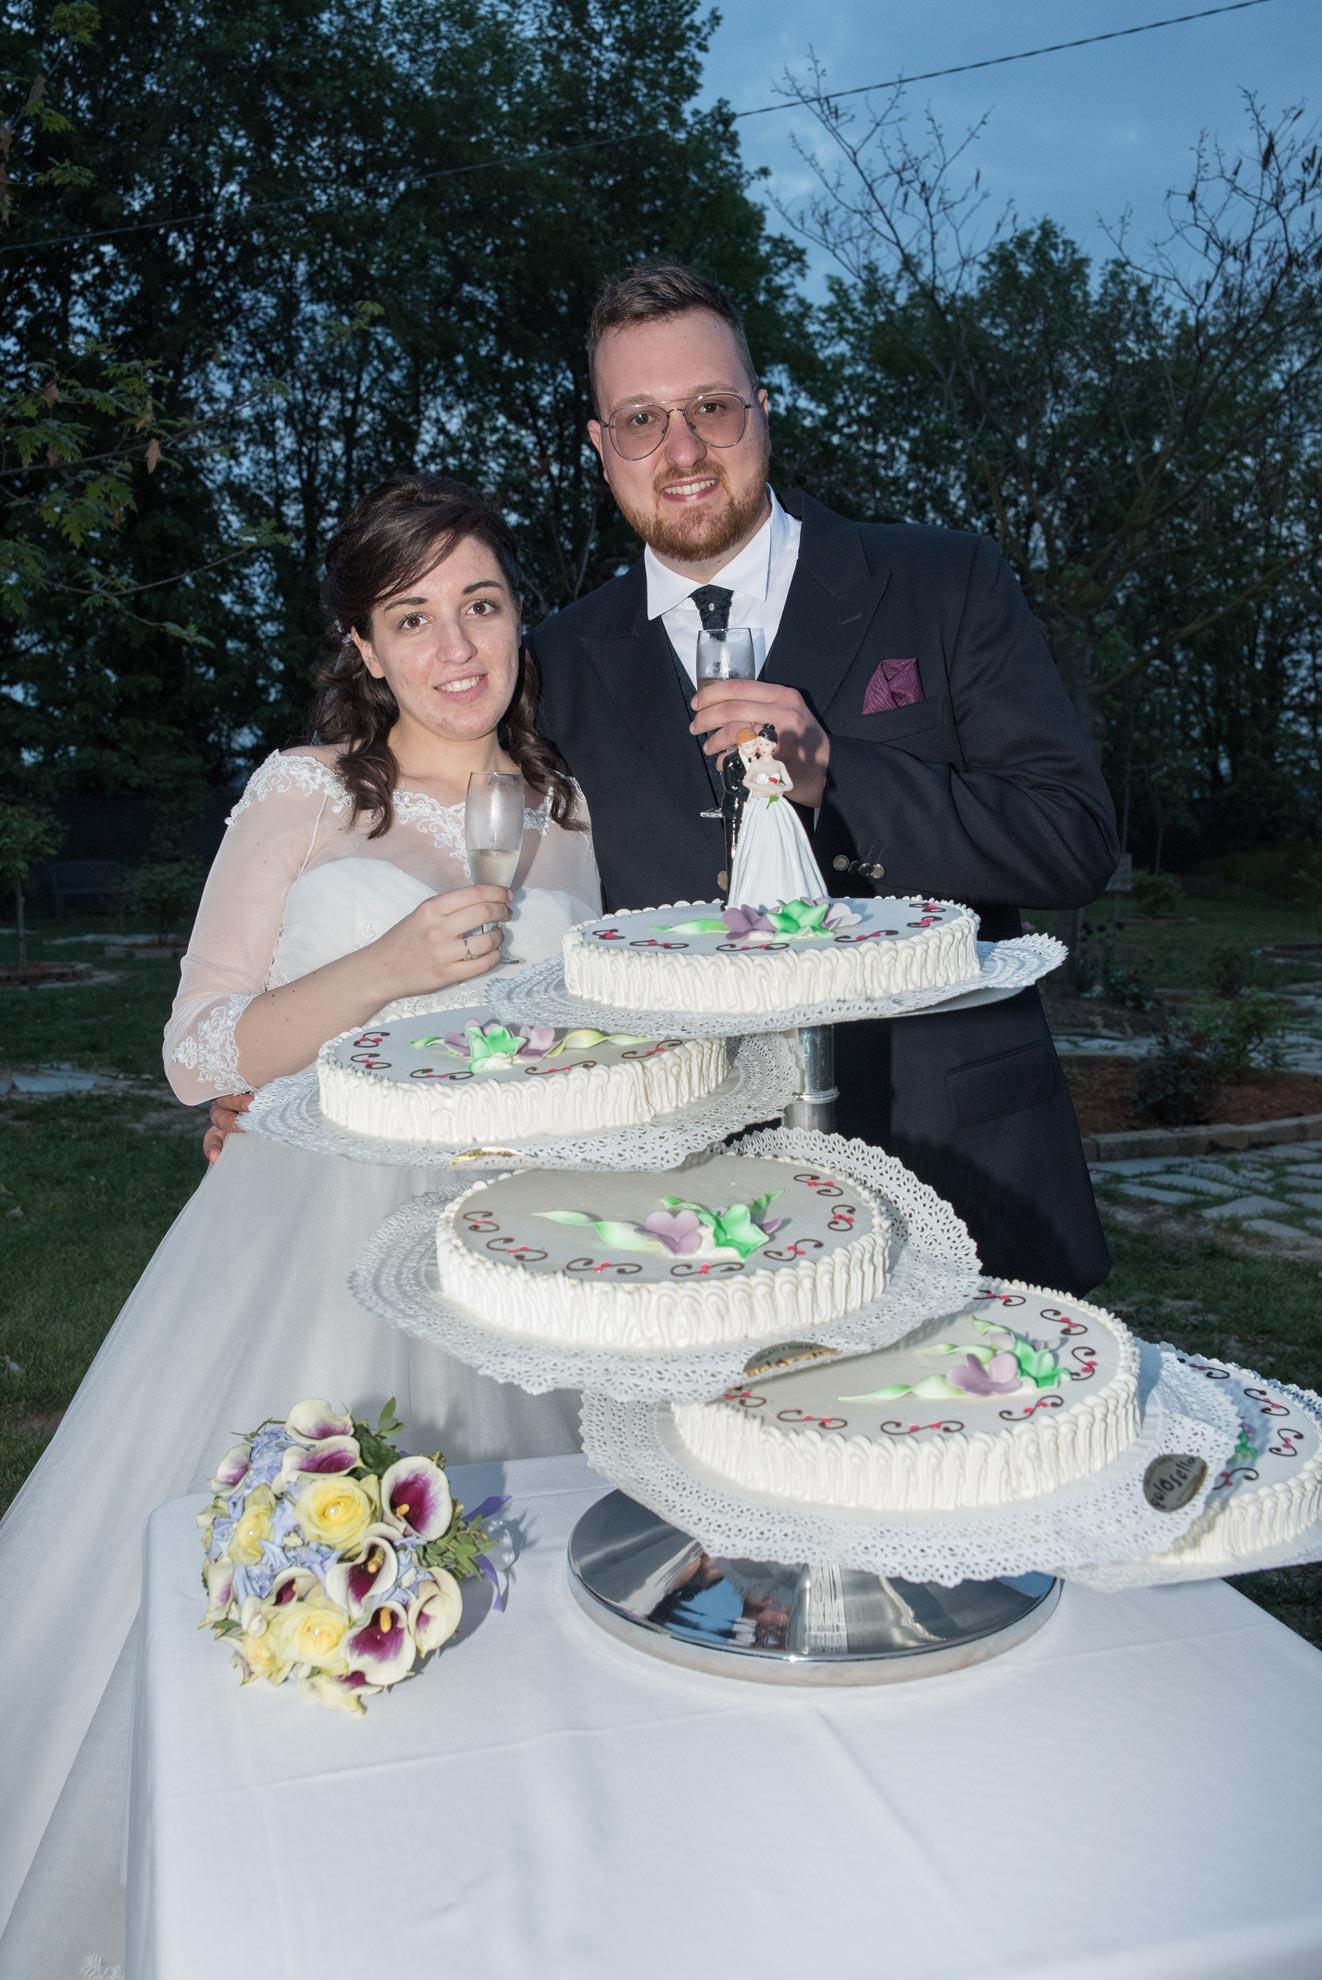 Matrimonio a Narzole Lorenza Diego - DSC 3415 - Fotografo matrimonio taglio della torta - Fotografo matrimonio taglio della torta